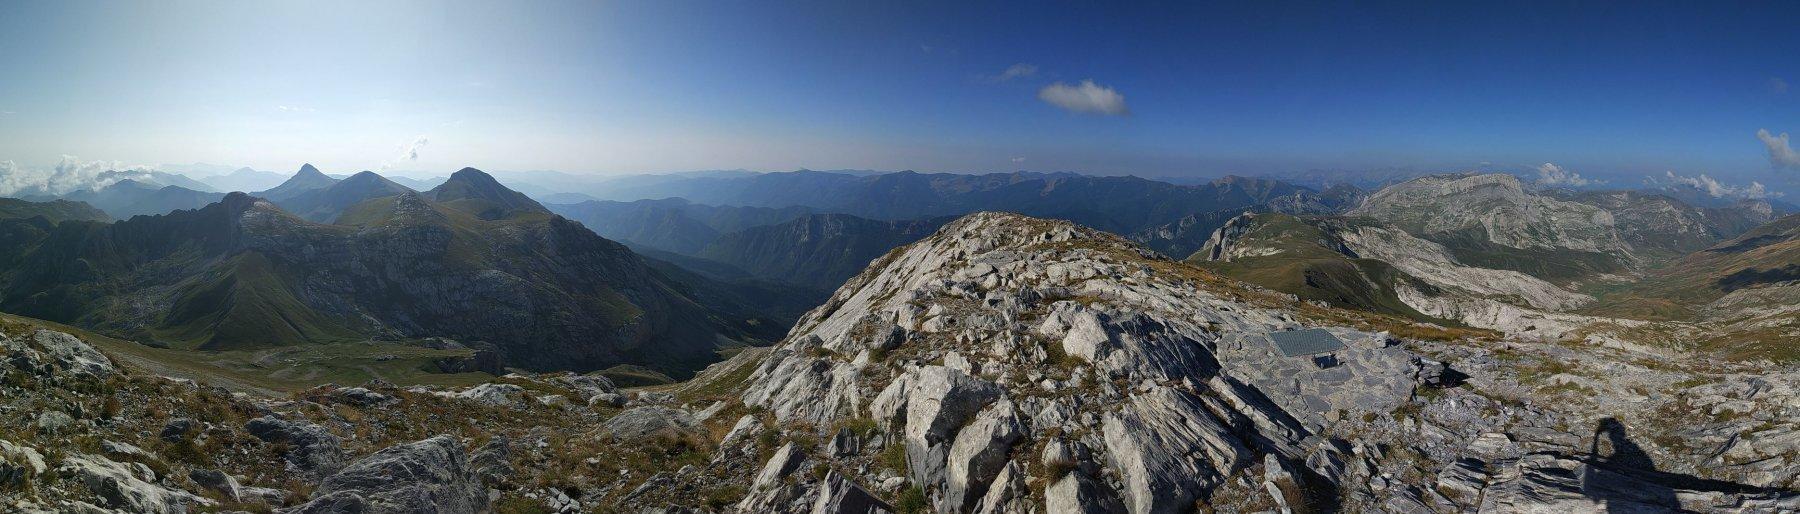 Panoramica verso la Liguria